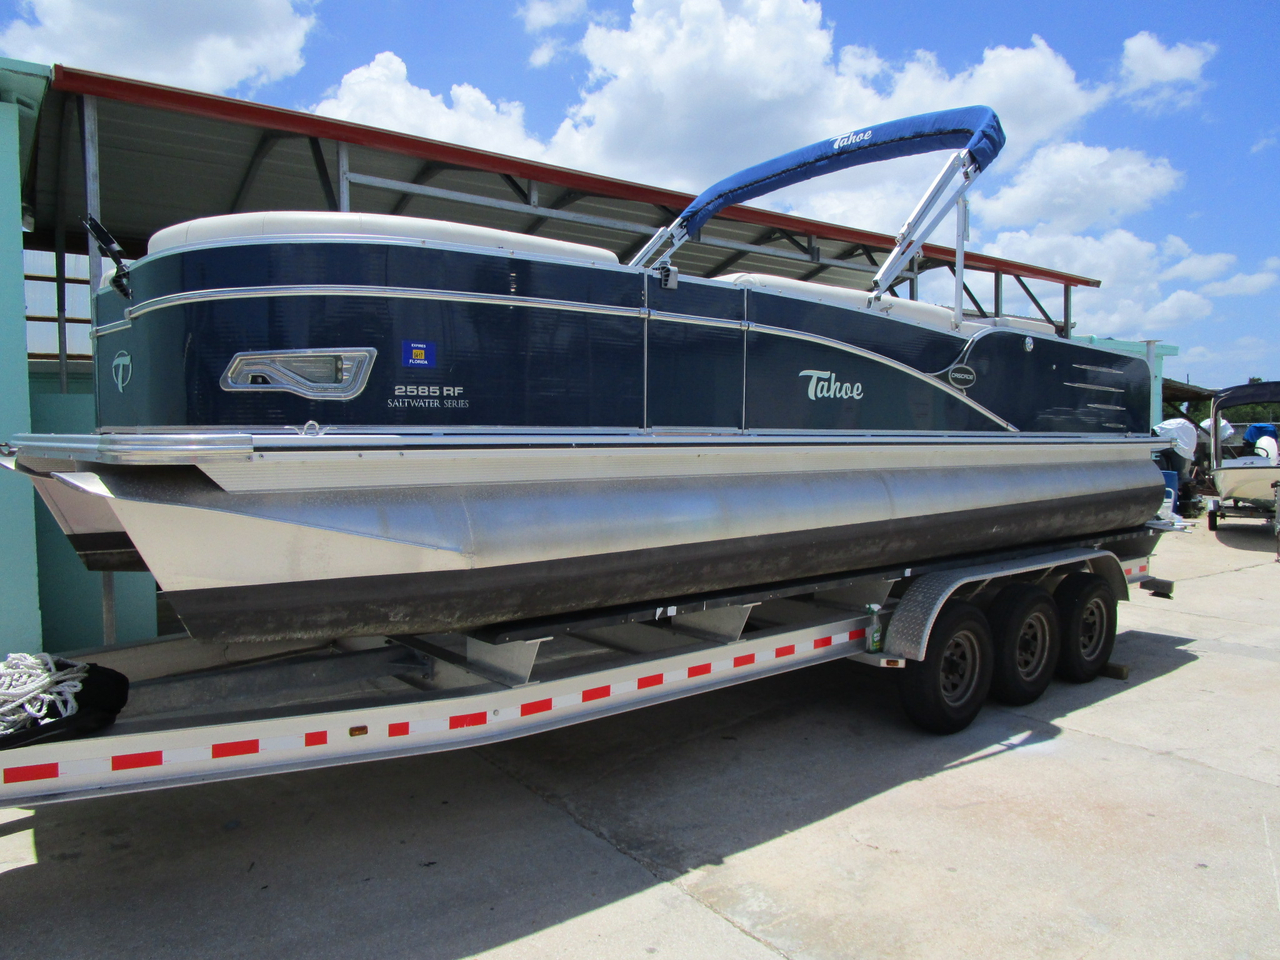 2015 used tahoe pontoons cascade rear fish 25 39 pontoon for Used fishing pontoon boats for sale